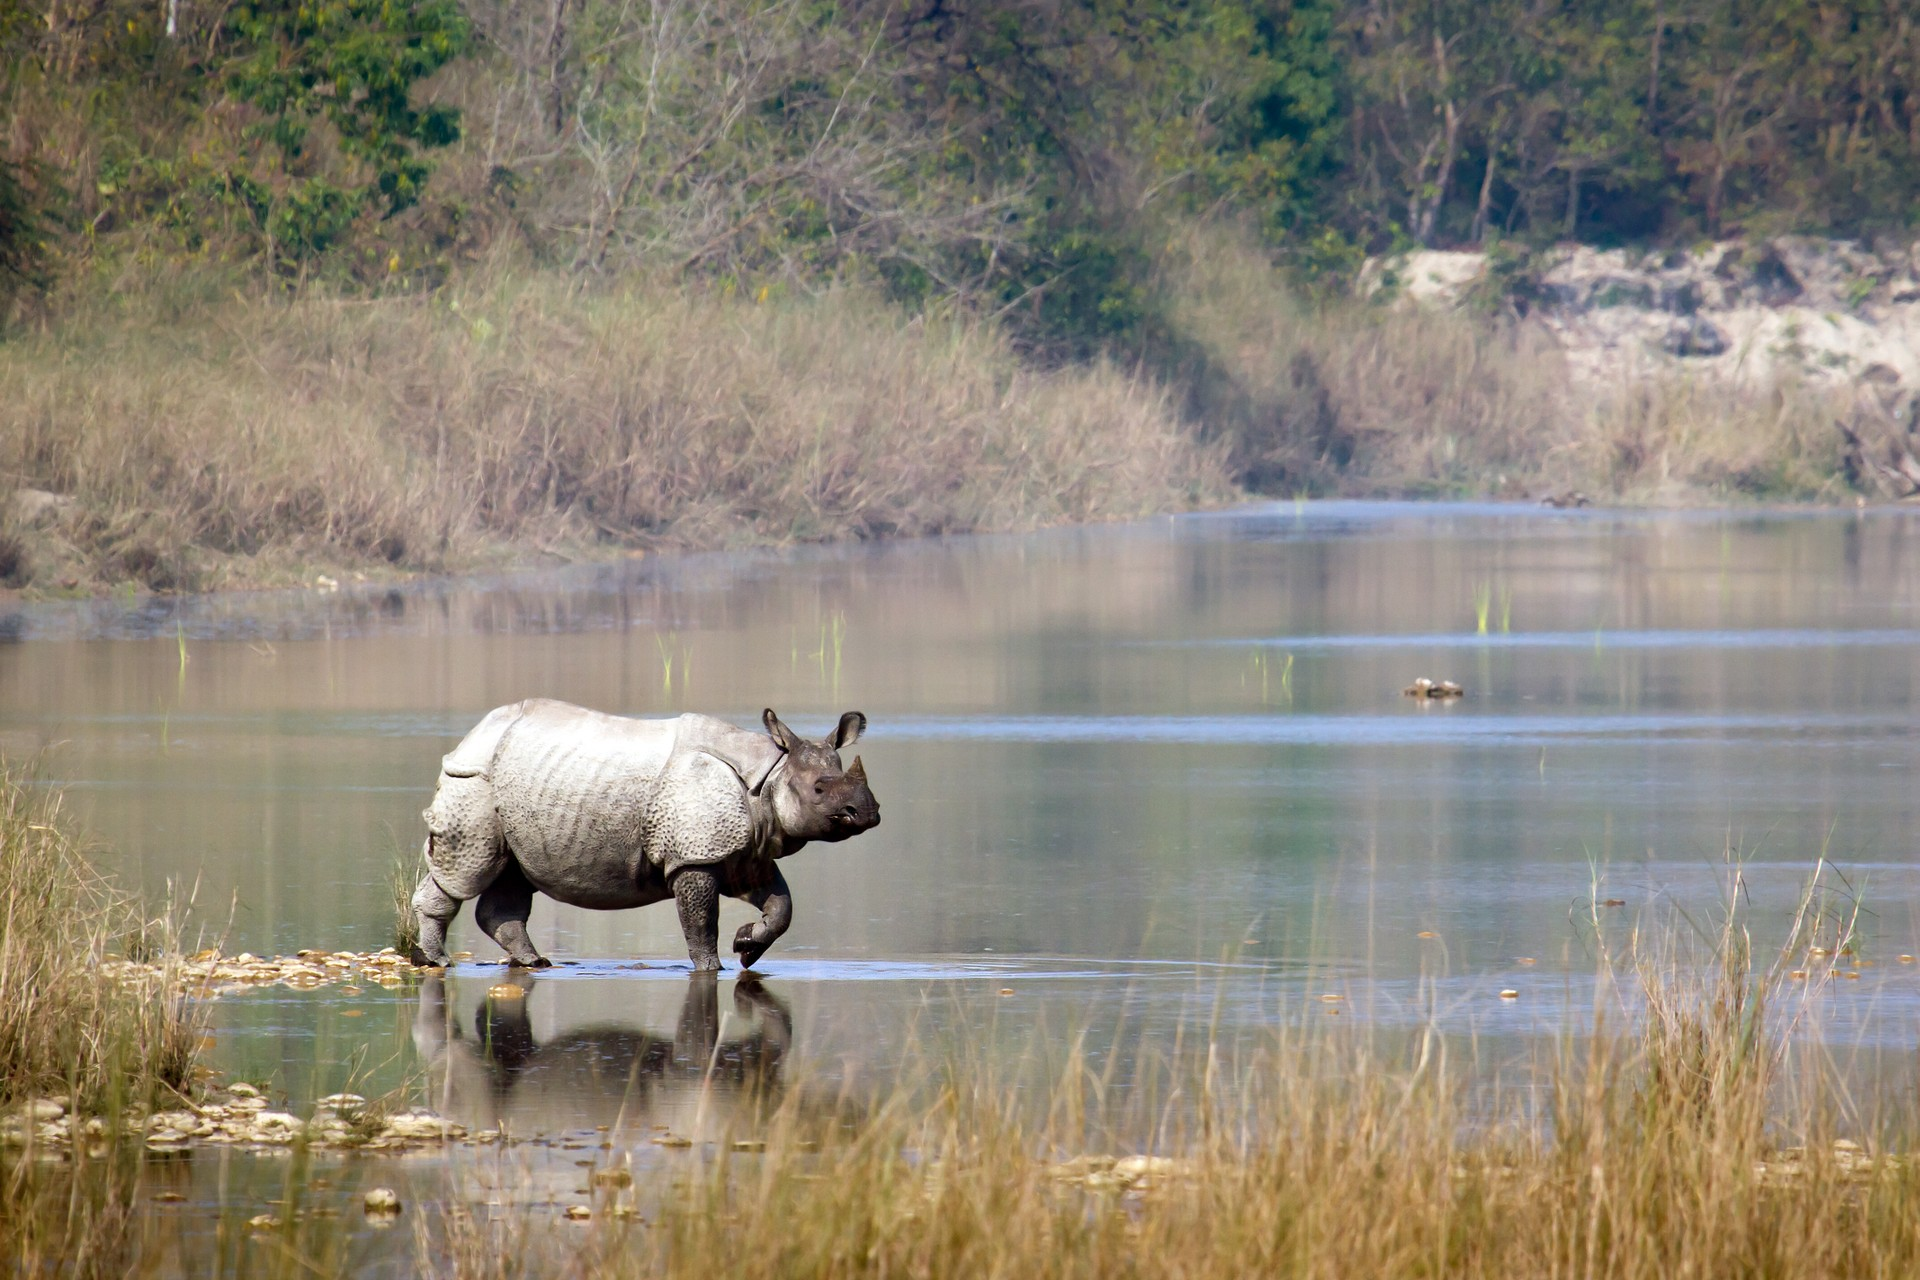 One-horned rhino in Chitwan National Park, Nepal